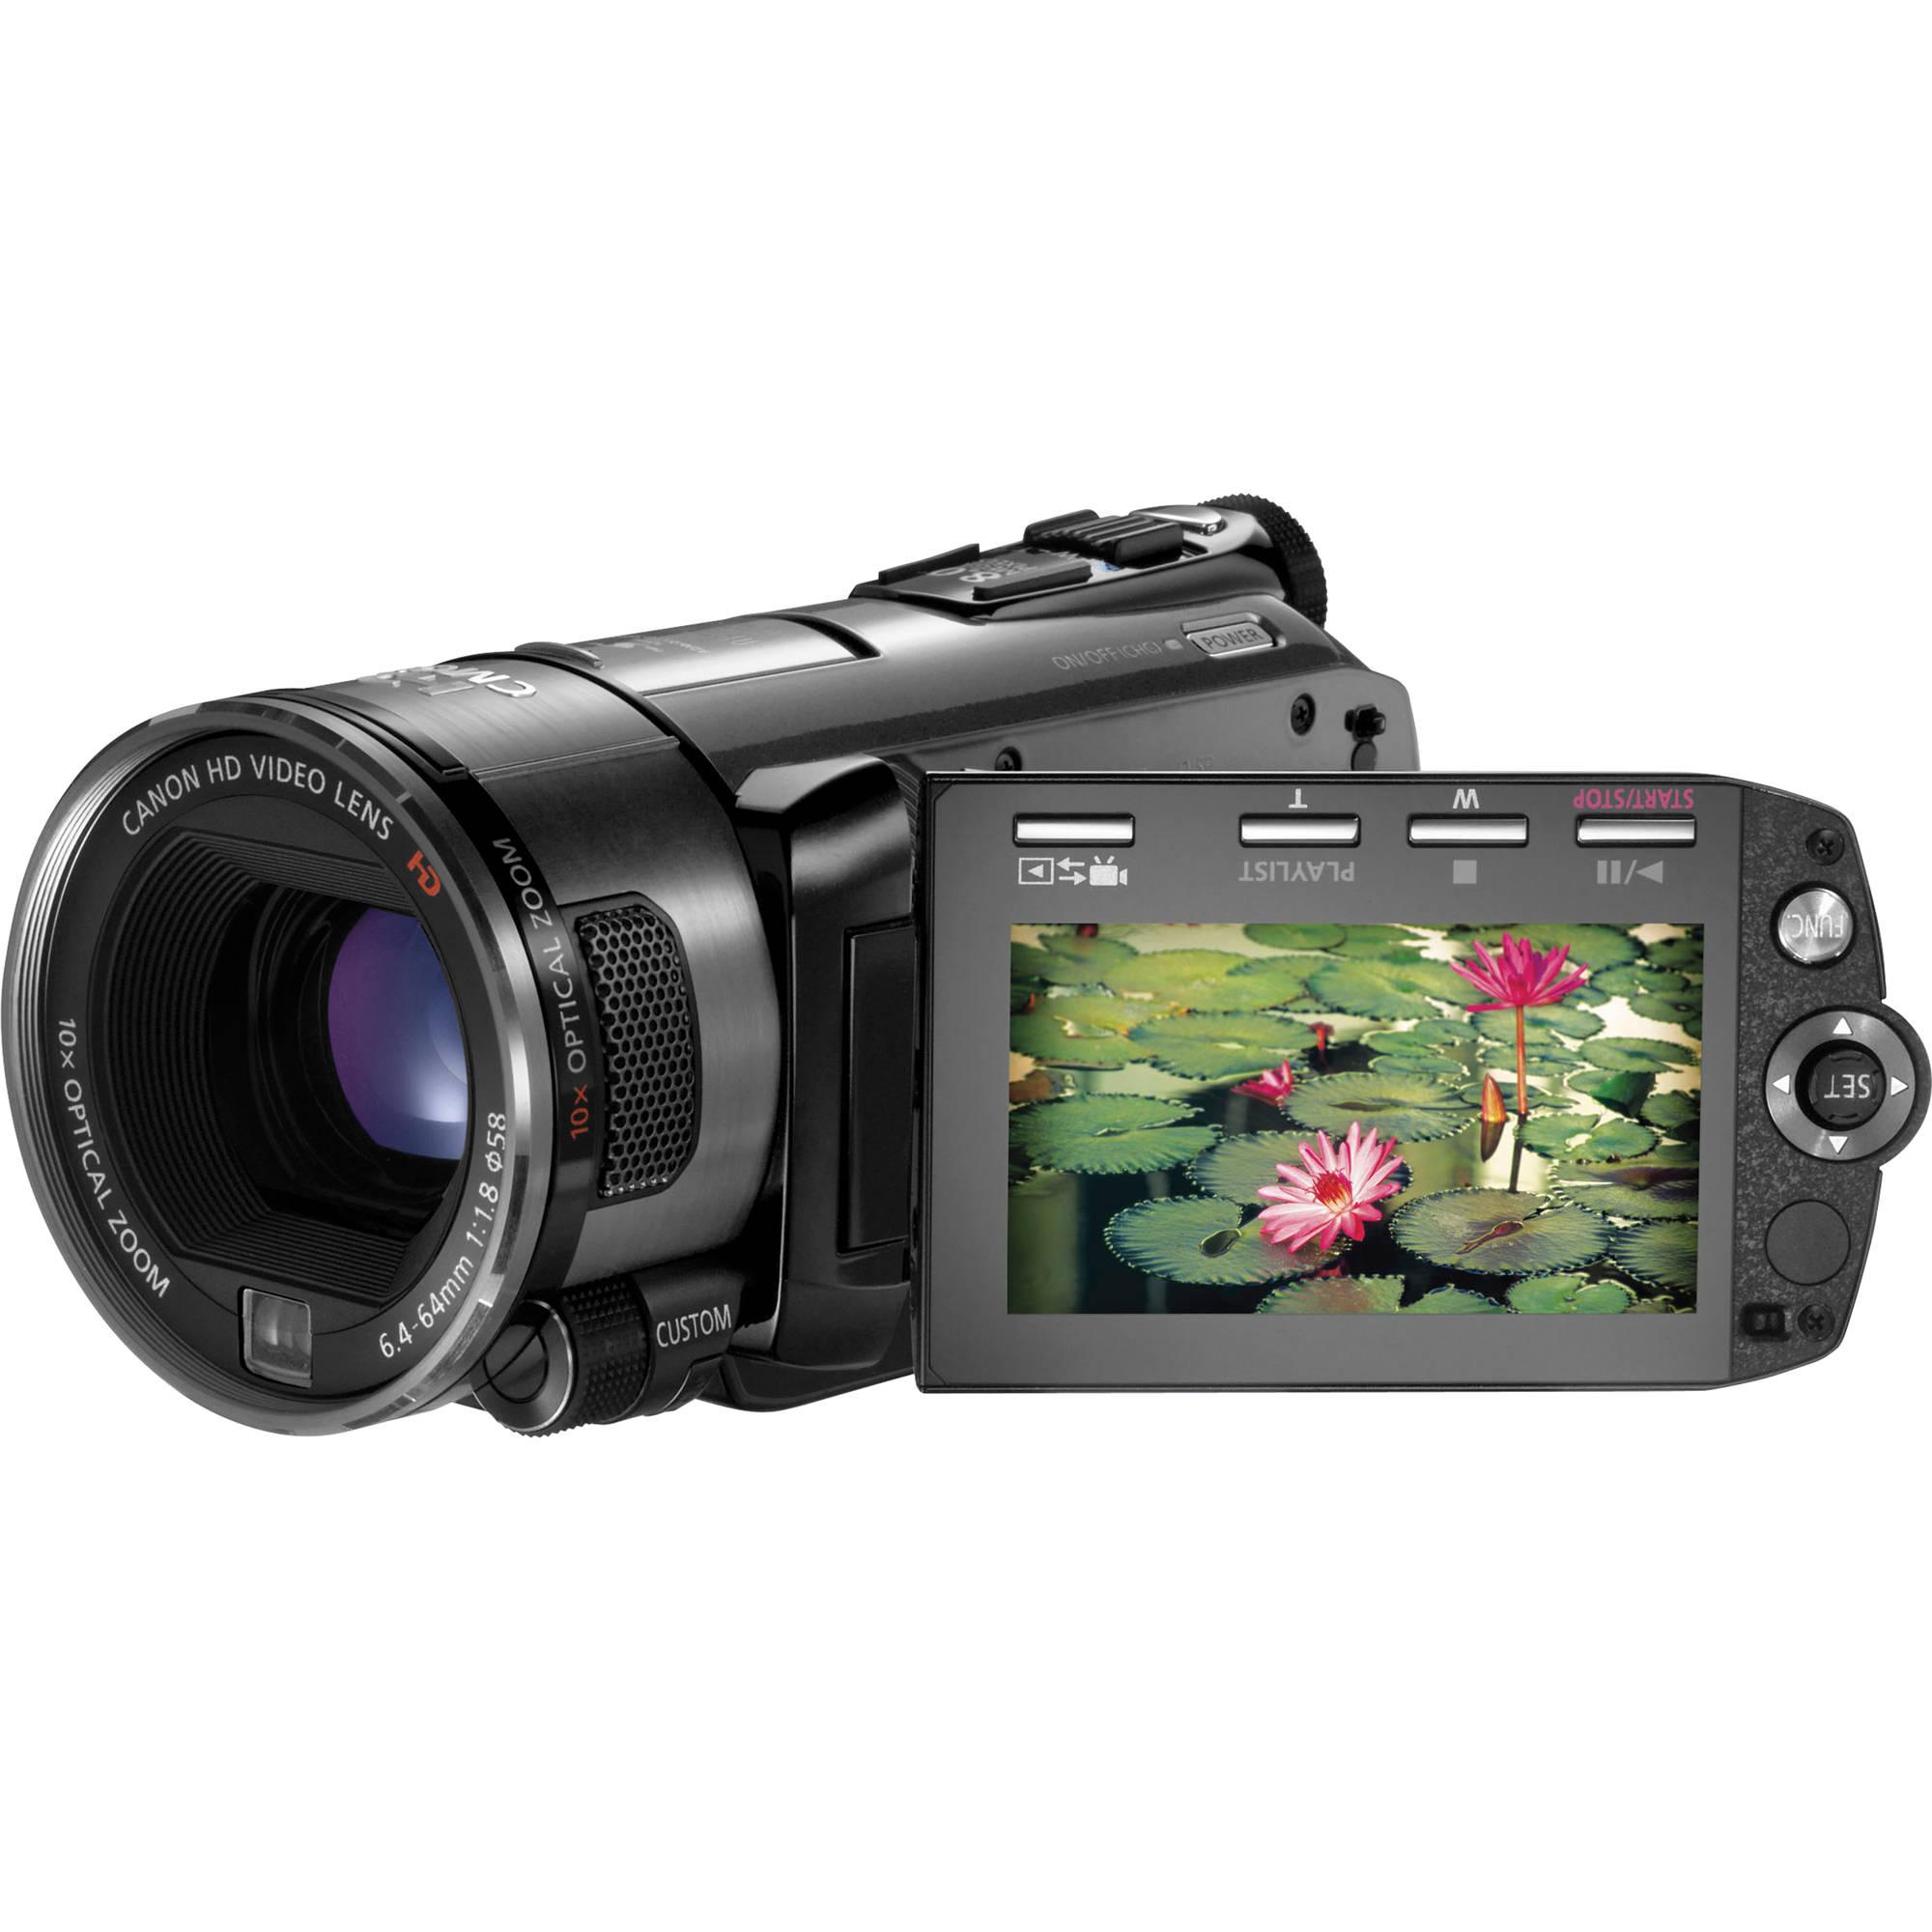 canon vixia hf s100 manual daily instruction manual guides u2022 rh testingwordpress co Canon VIXIA HF R32 canon vixia hfm300 manual